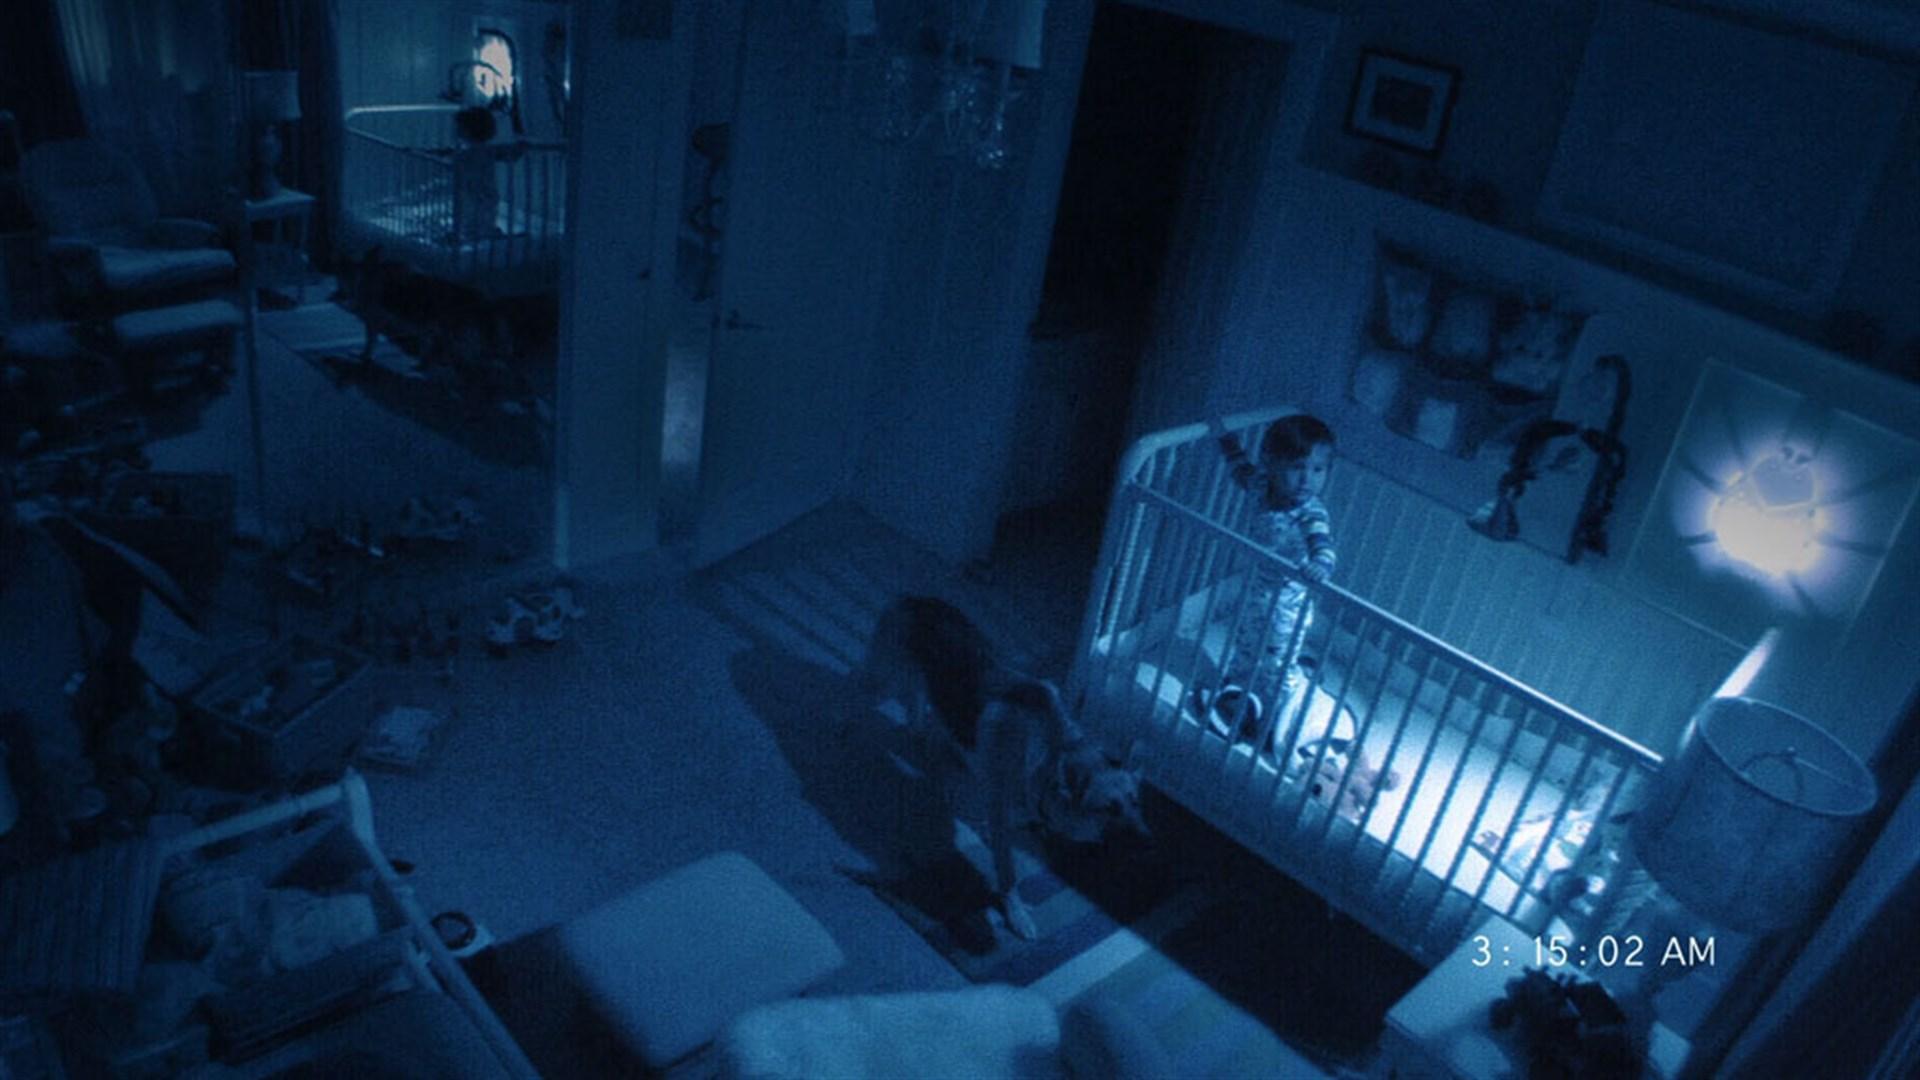 paranormal-activity-1563995631139.jpg